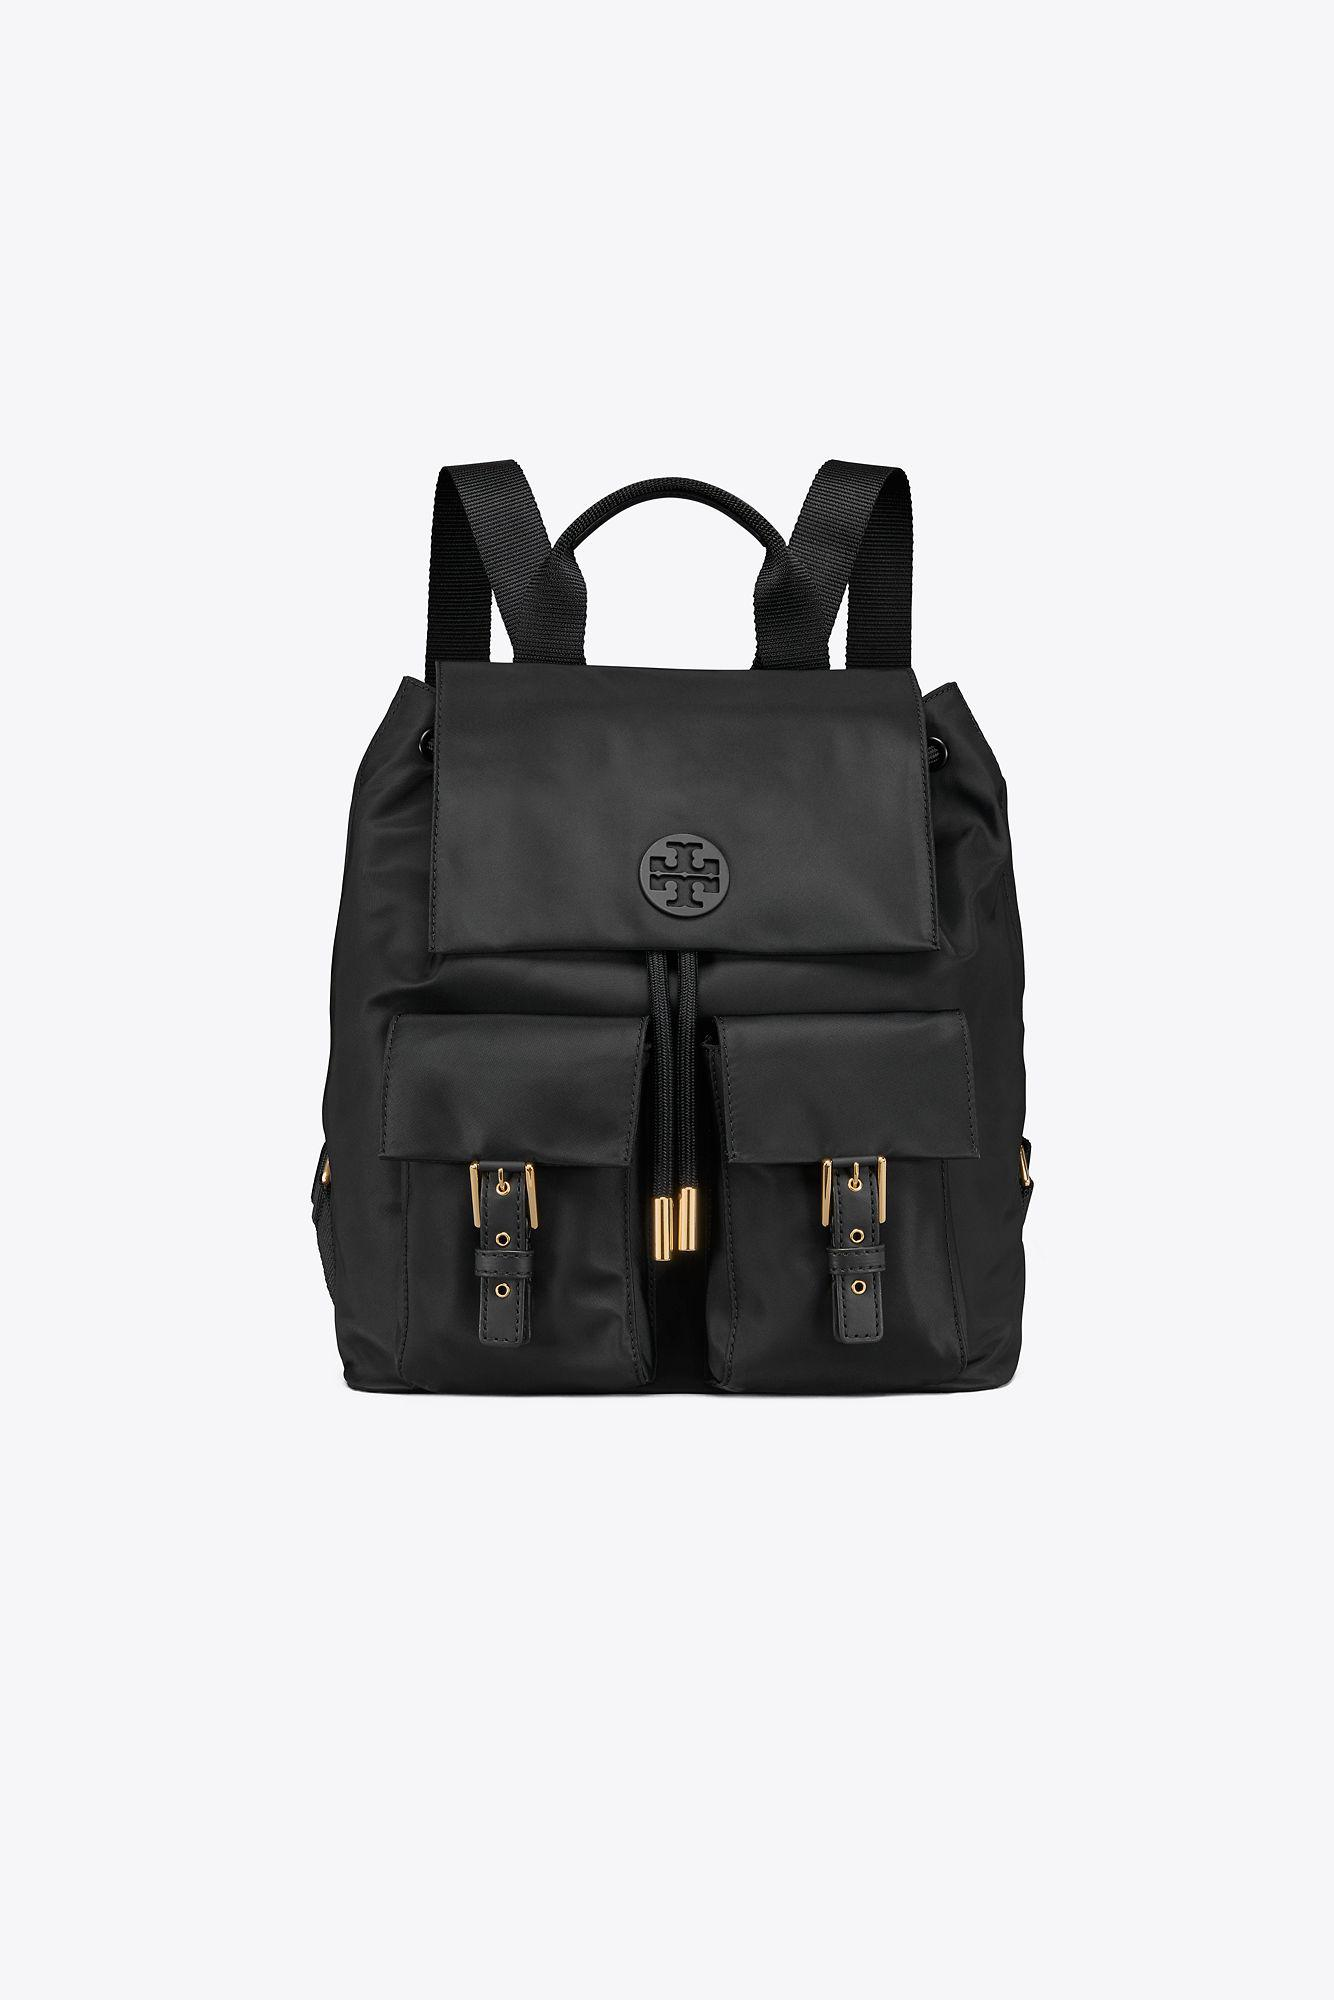 f16d4dd063f3 Tory Burch Tilda Nylon Flap Backpack in Black - Lyst